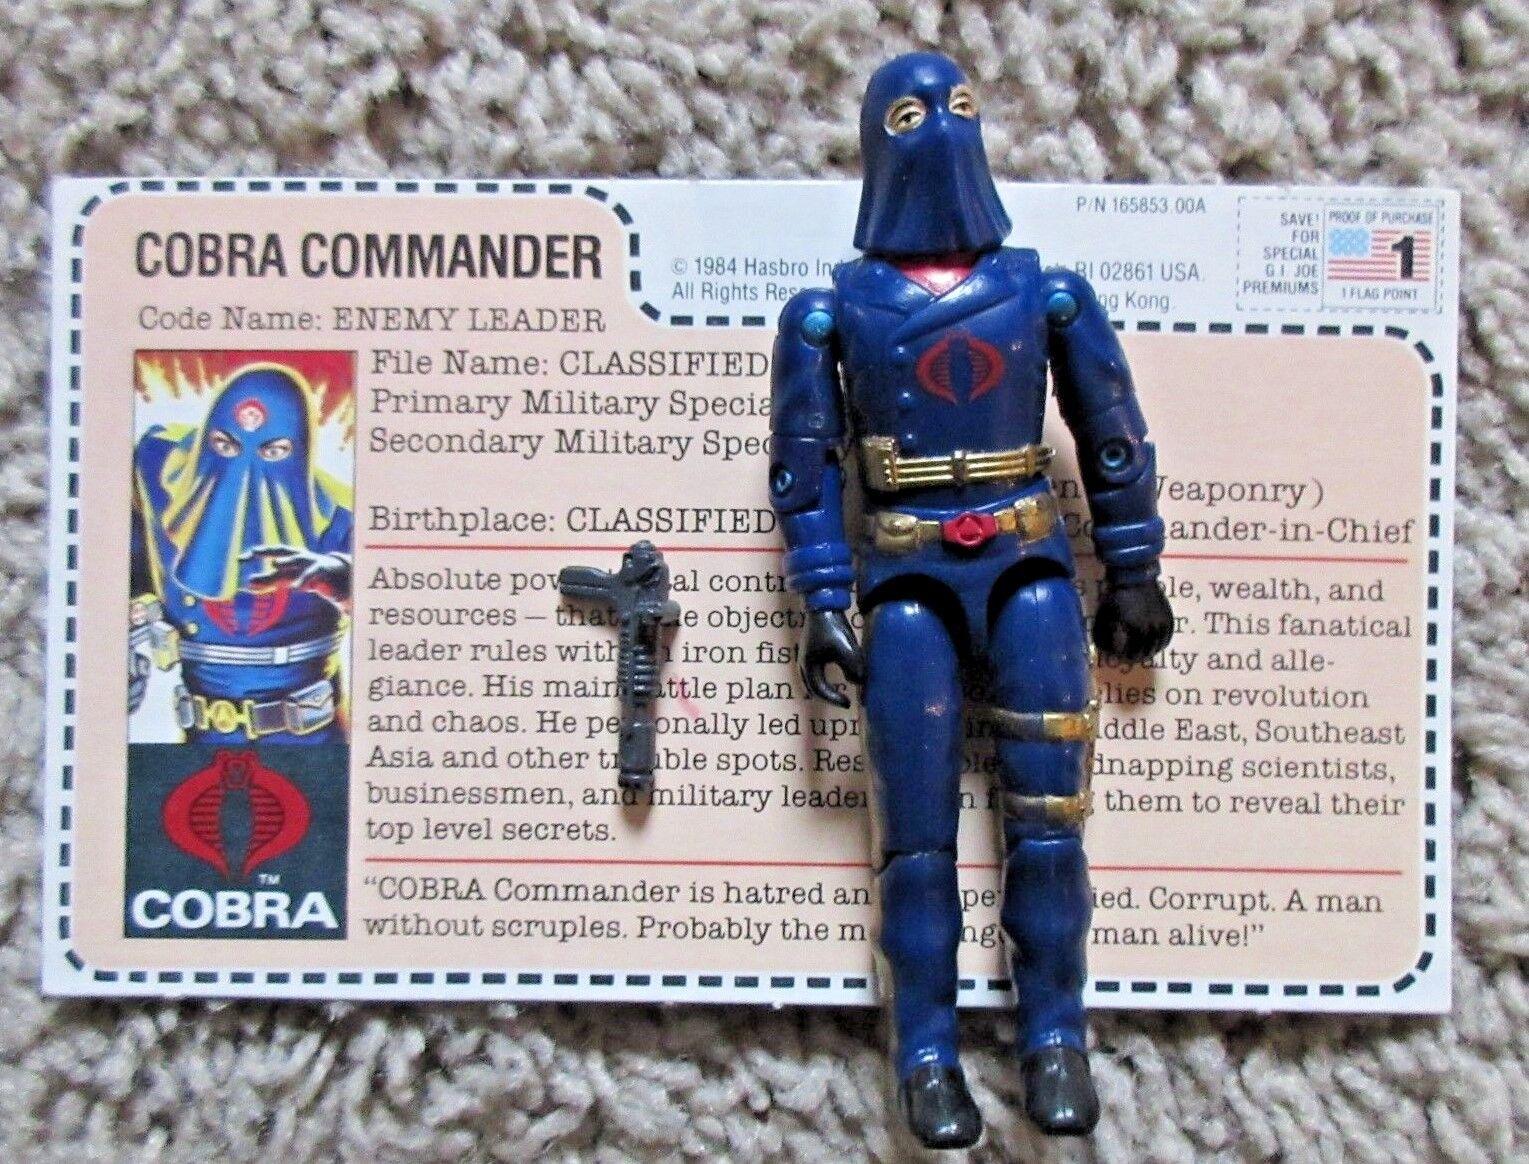 G.I. Joe Vintage Cobra Commander correo lejos con Capucha figura 3.75  completa GI